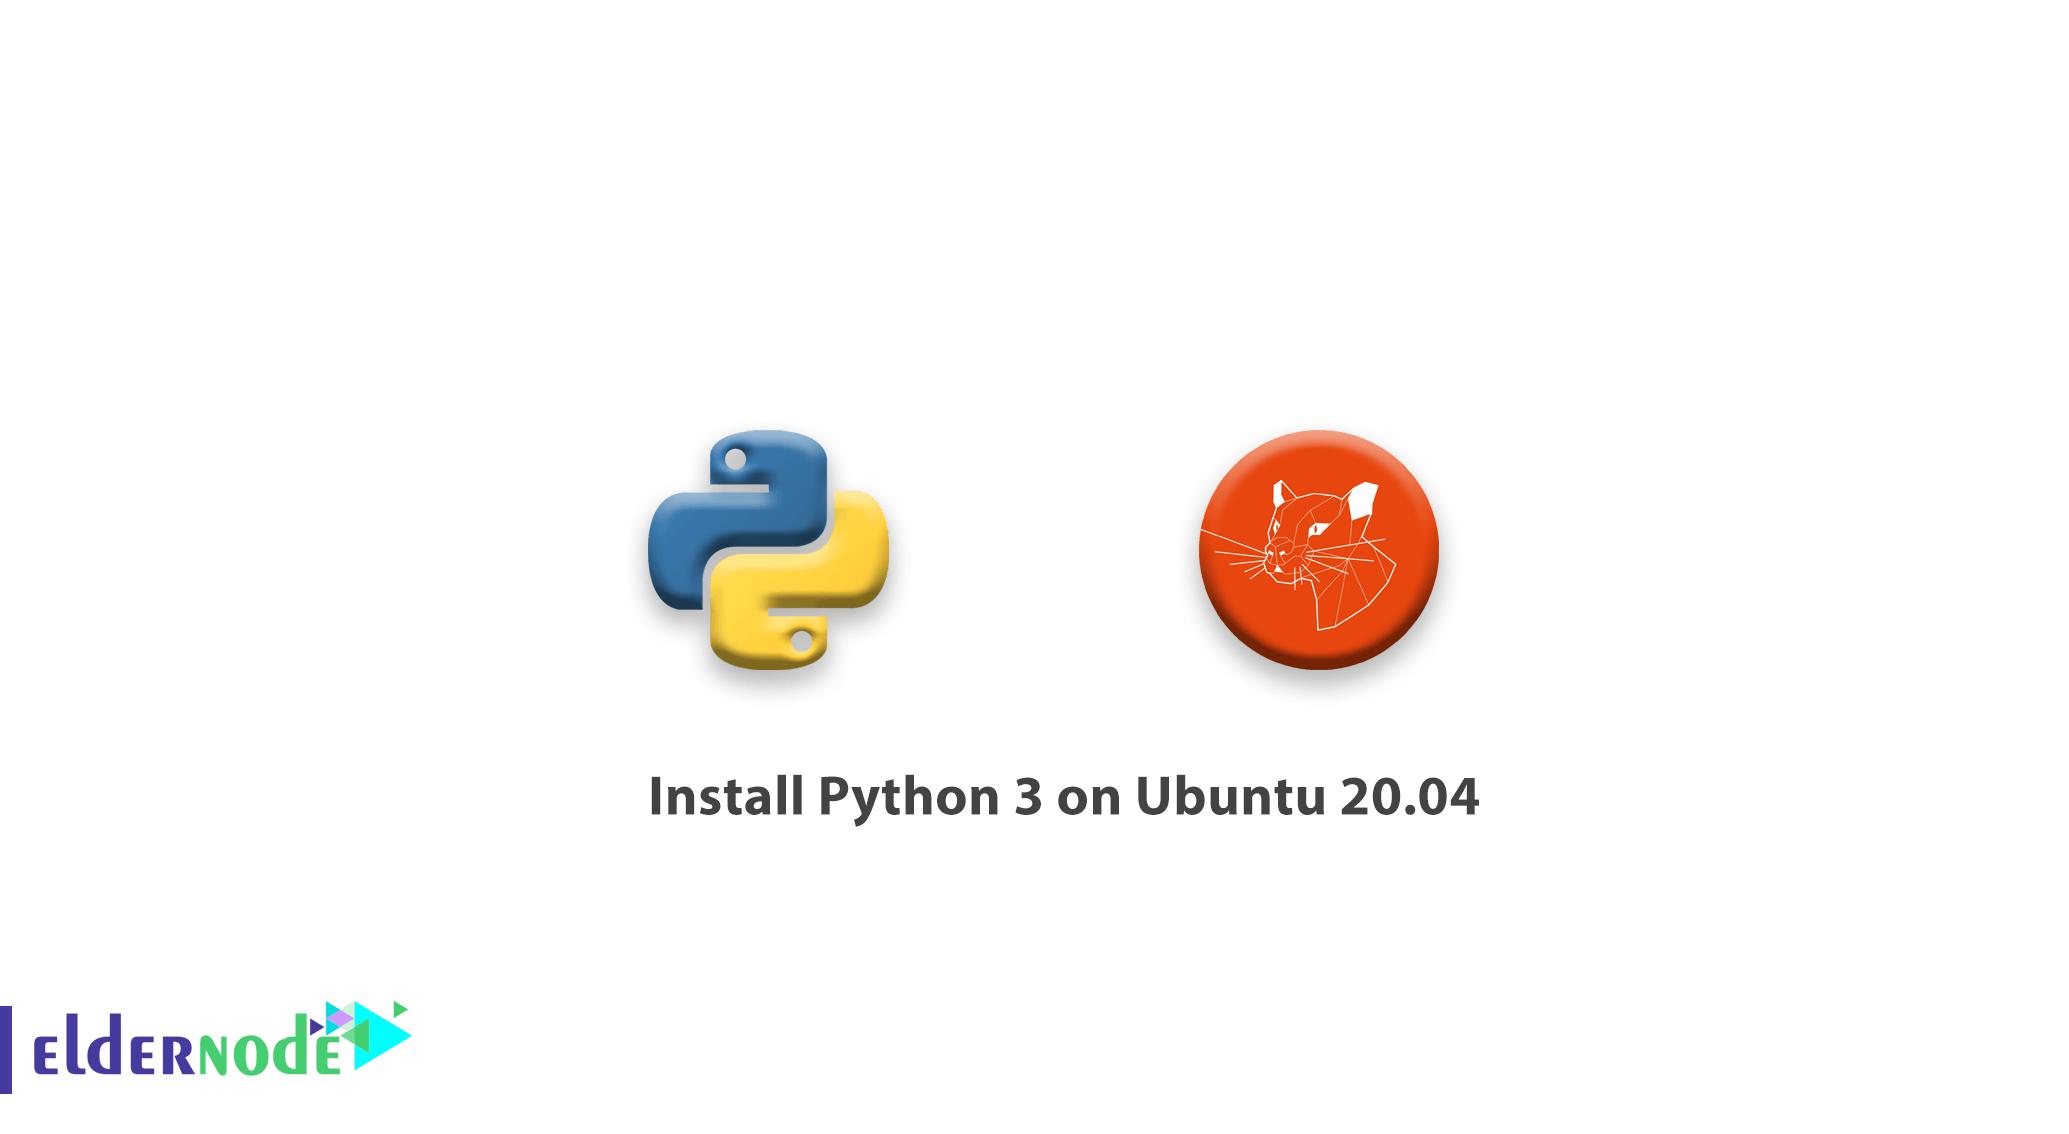 How to install Python 3 on Ubuntu 20.04